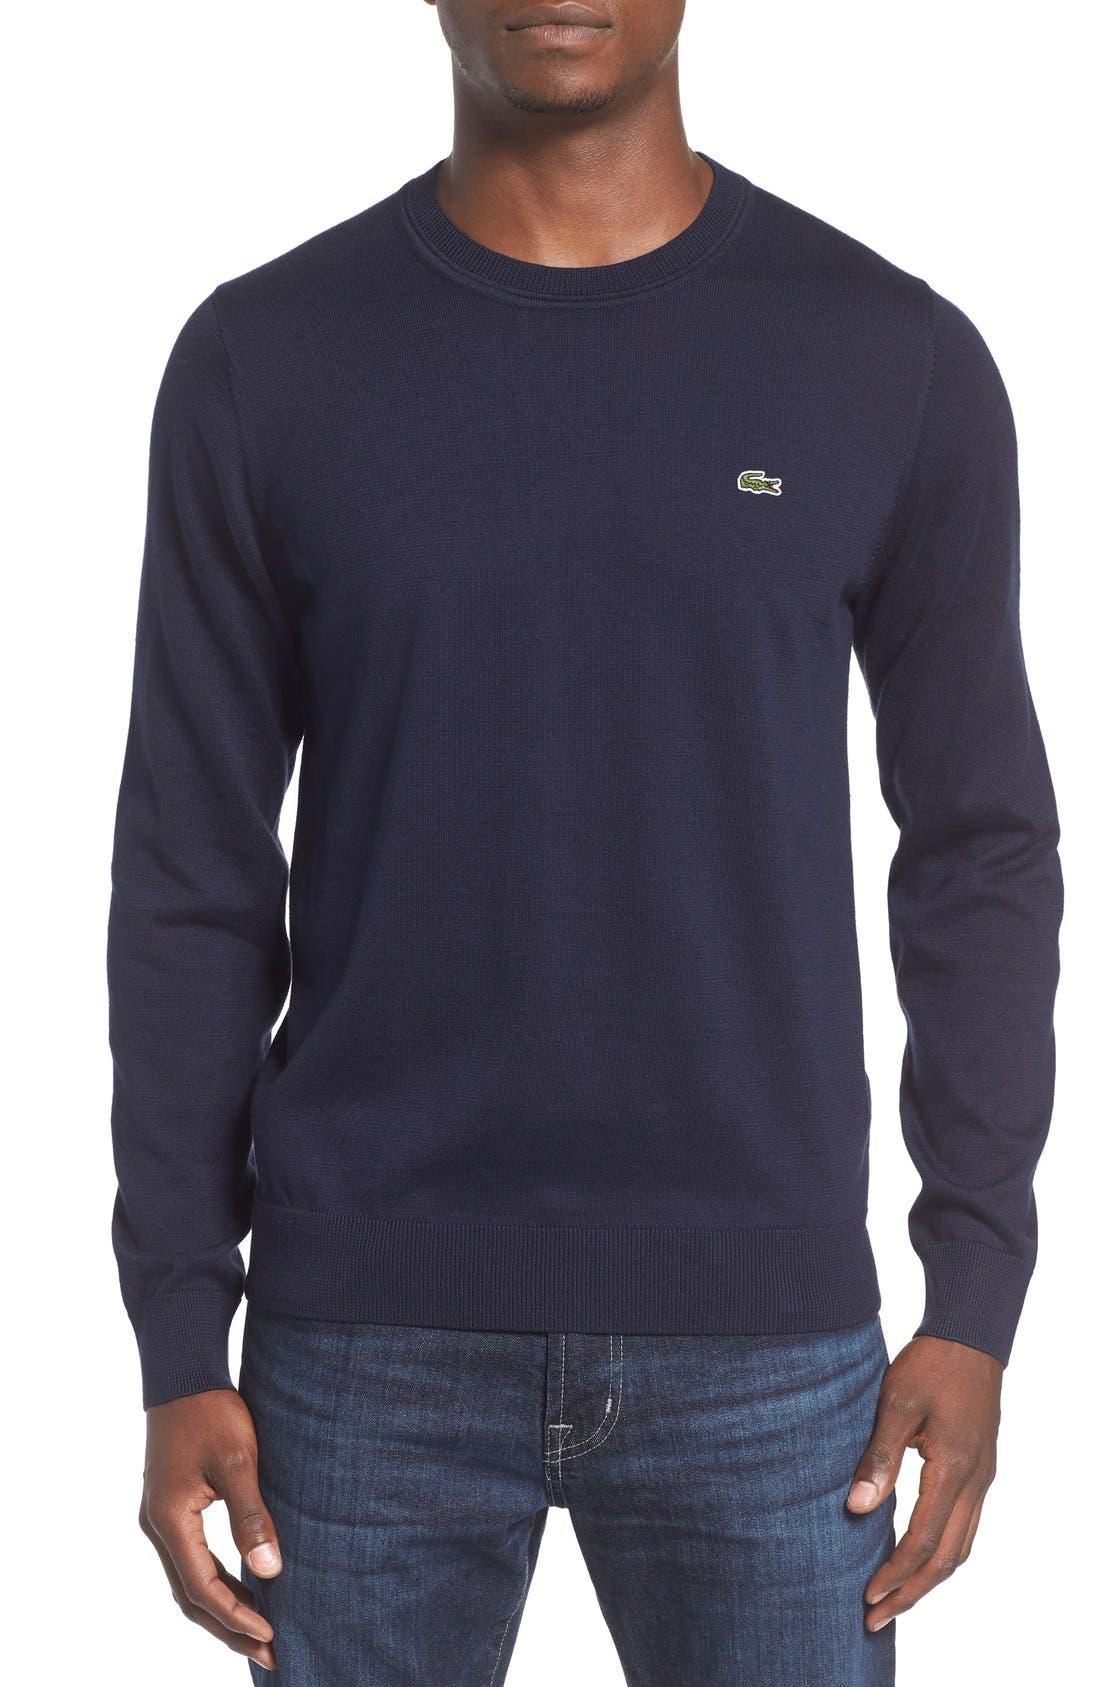 Jersey Knit Crewneck Sweater,                         Main,                         color, Navy Blue